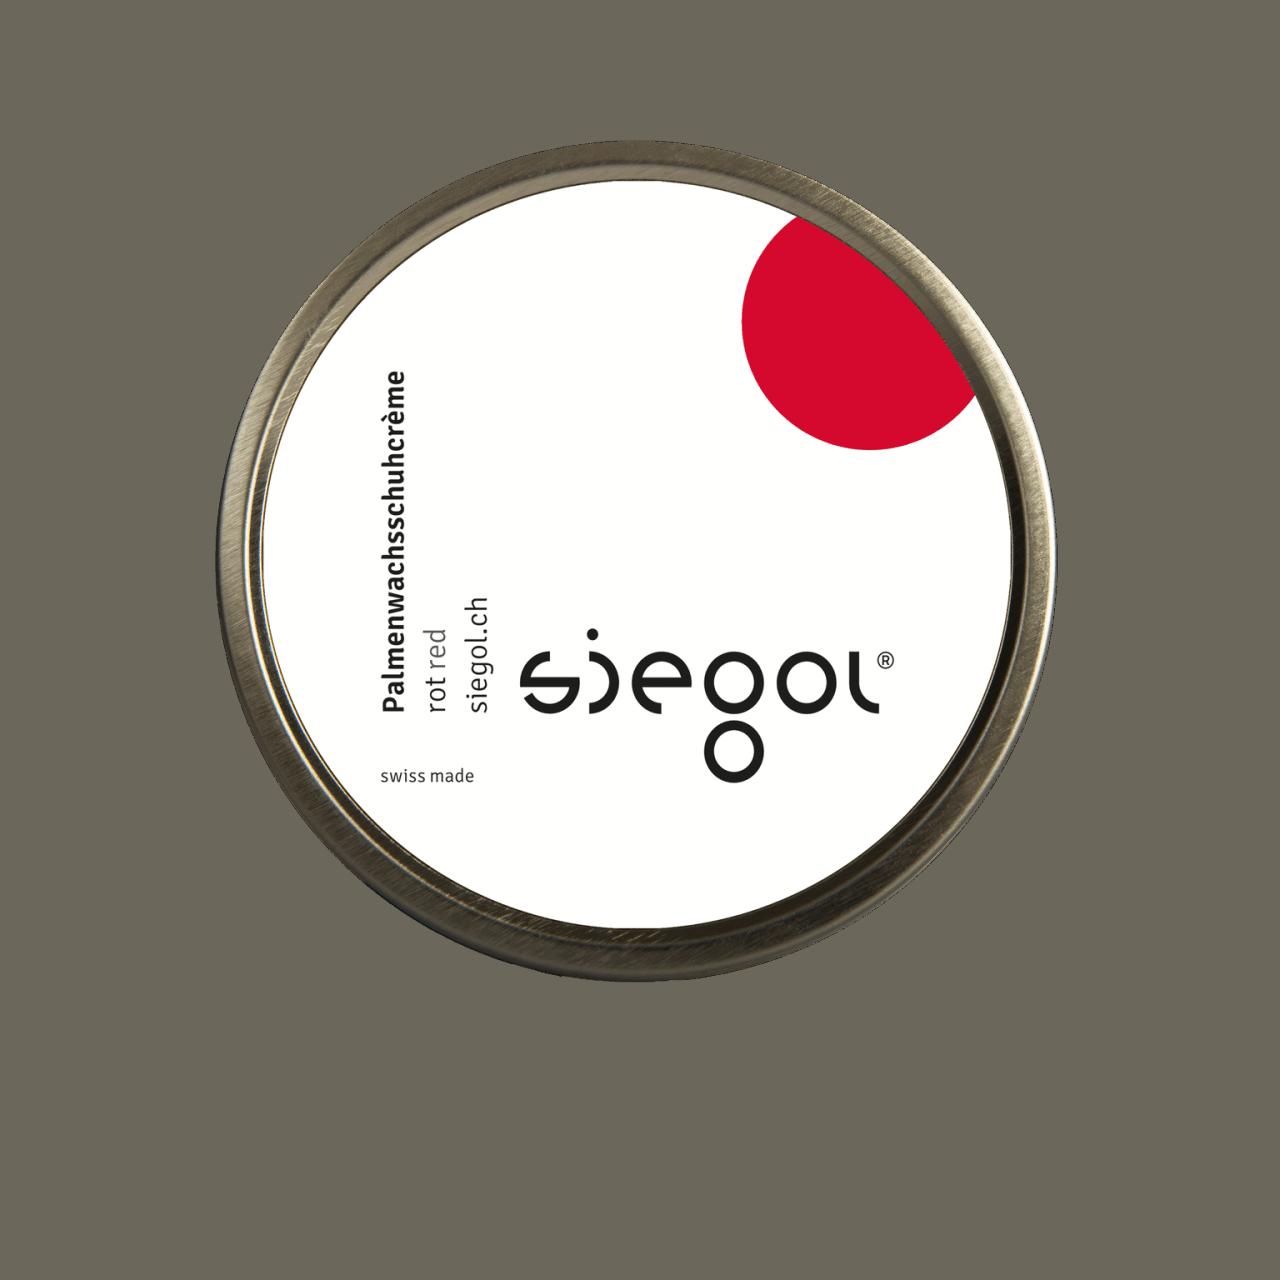 Siegol Palmenwax 100ml - red